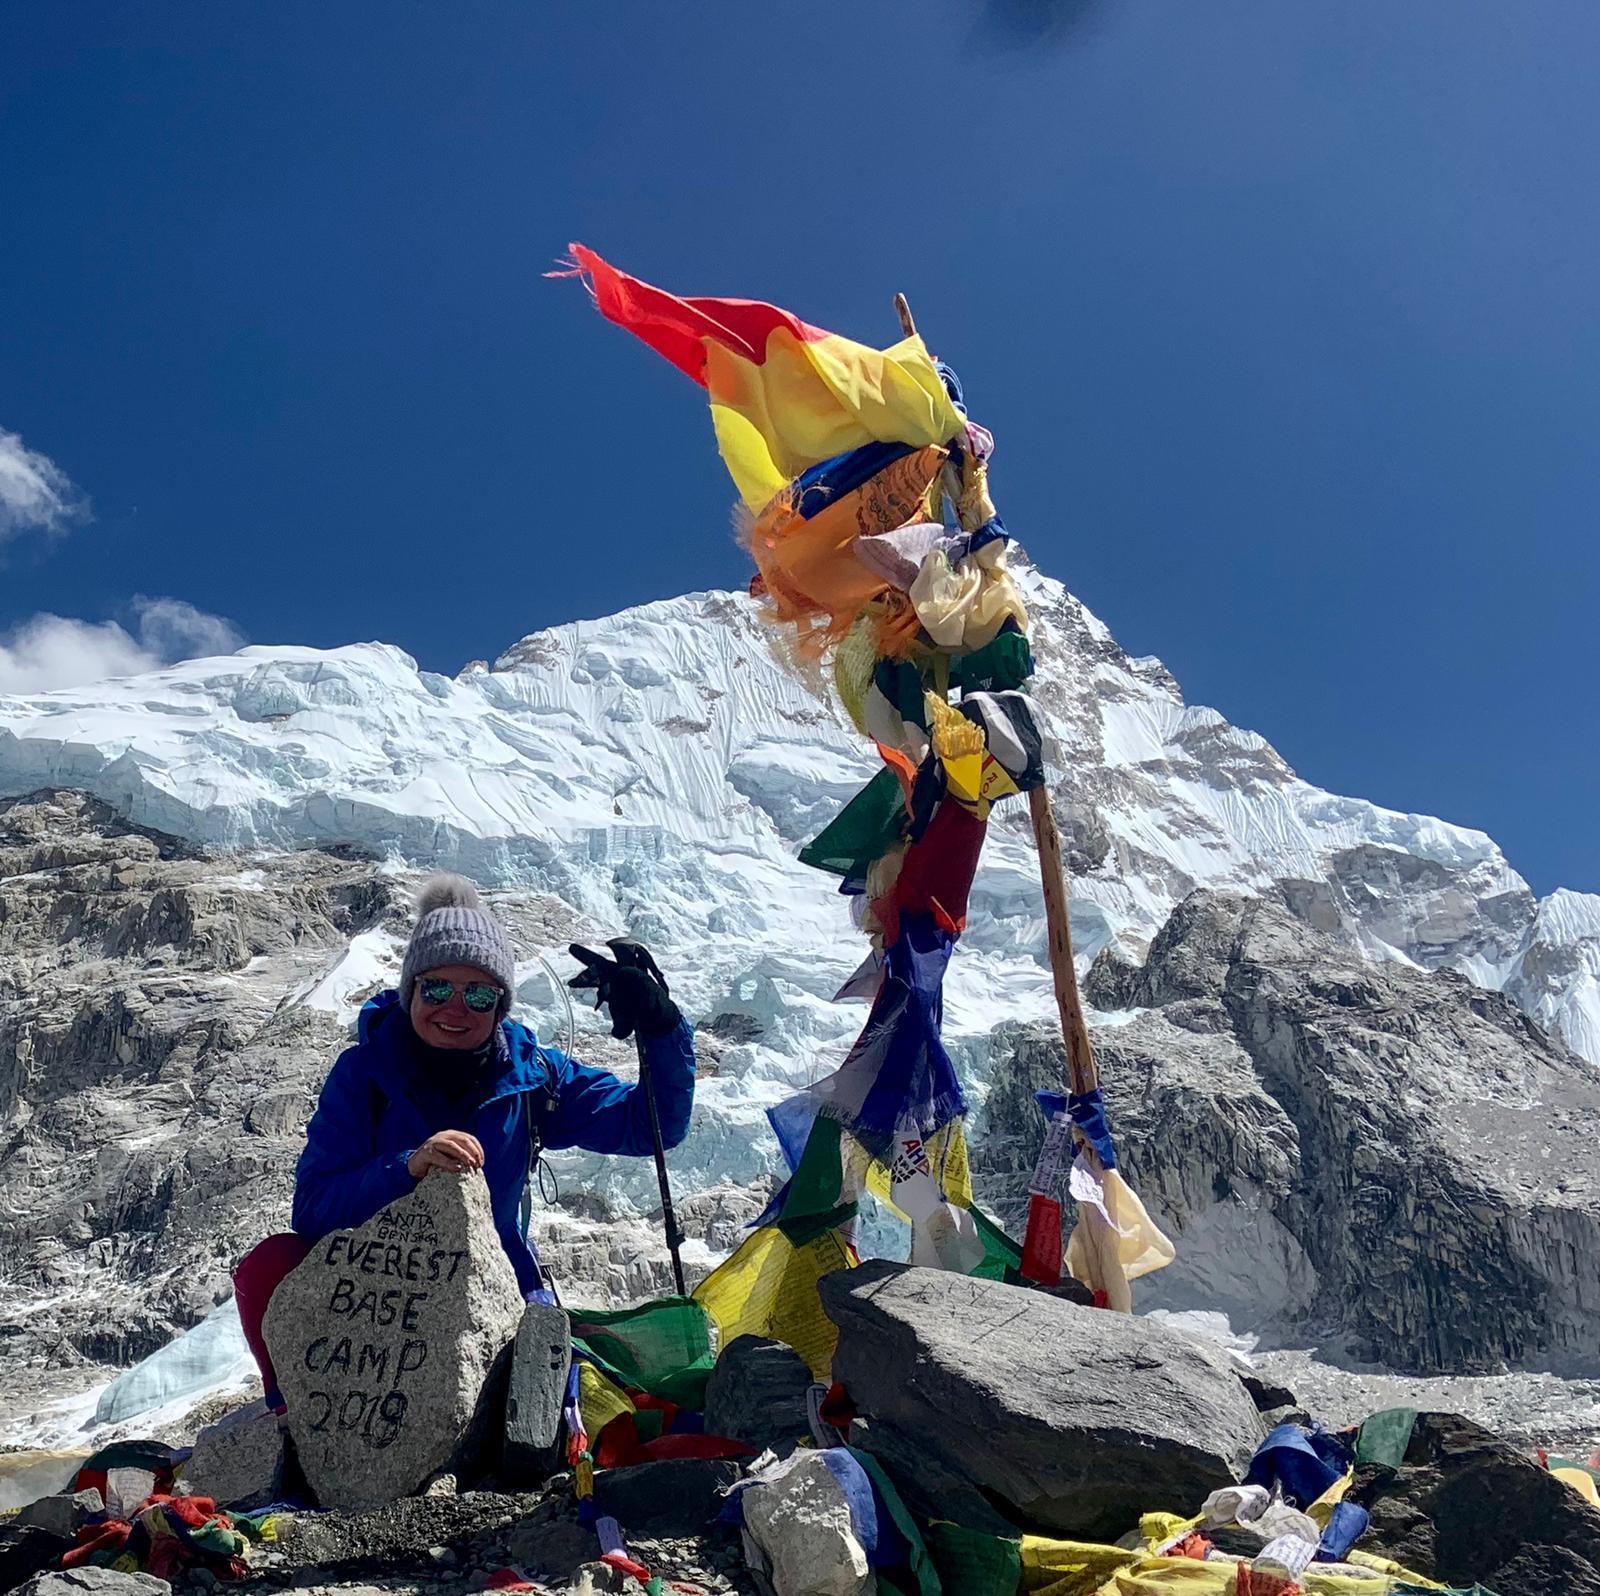 Catriona O'Brien Everest Base Camp Climb The Sisterhood